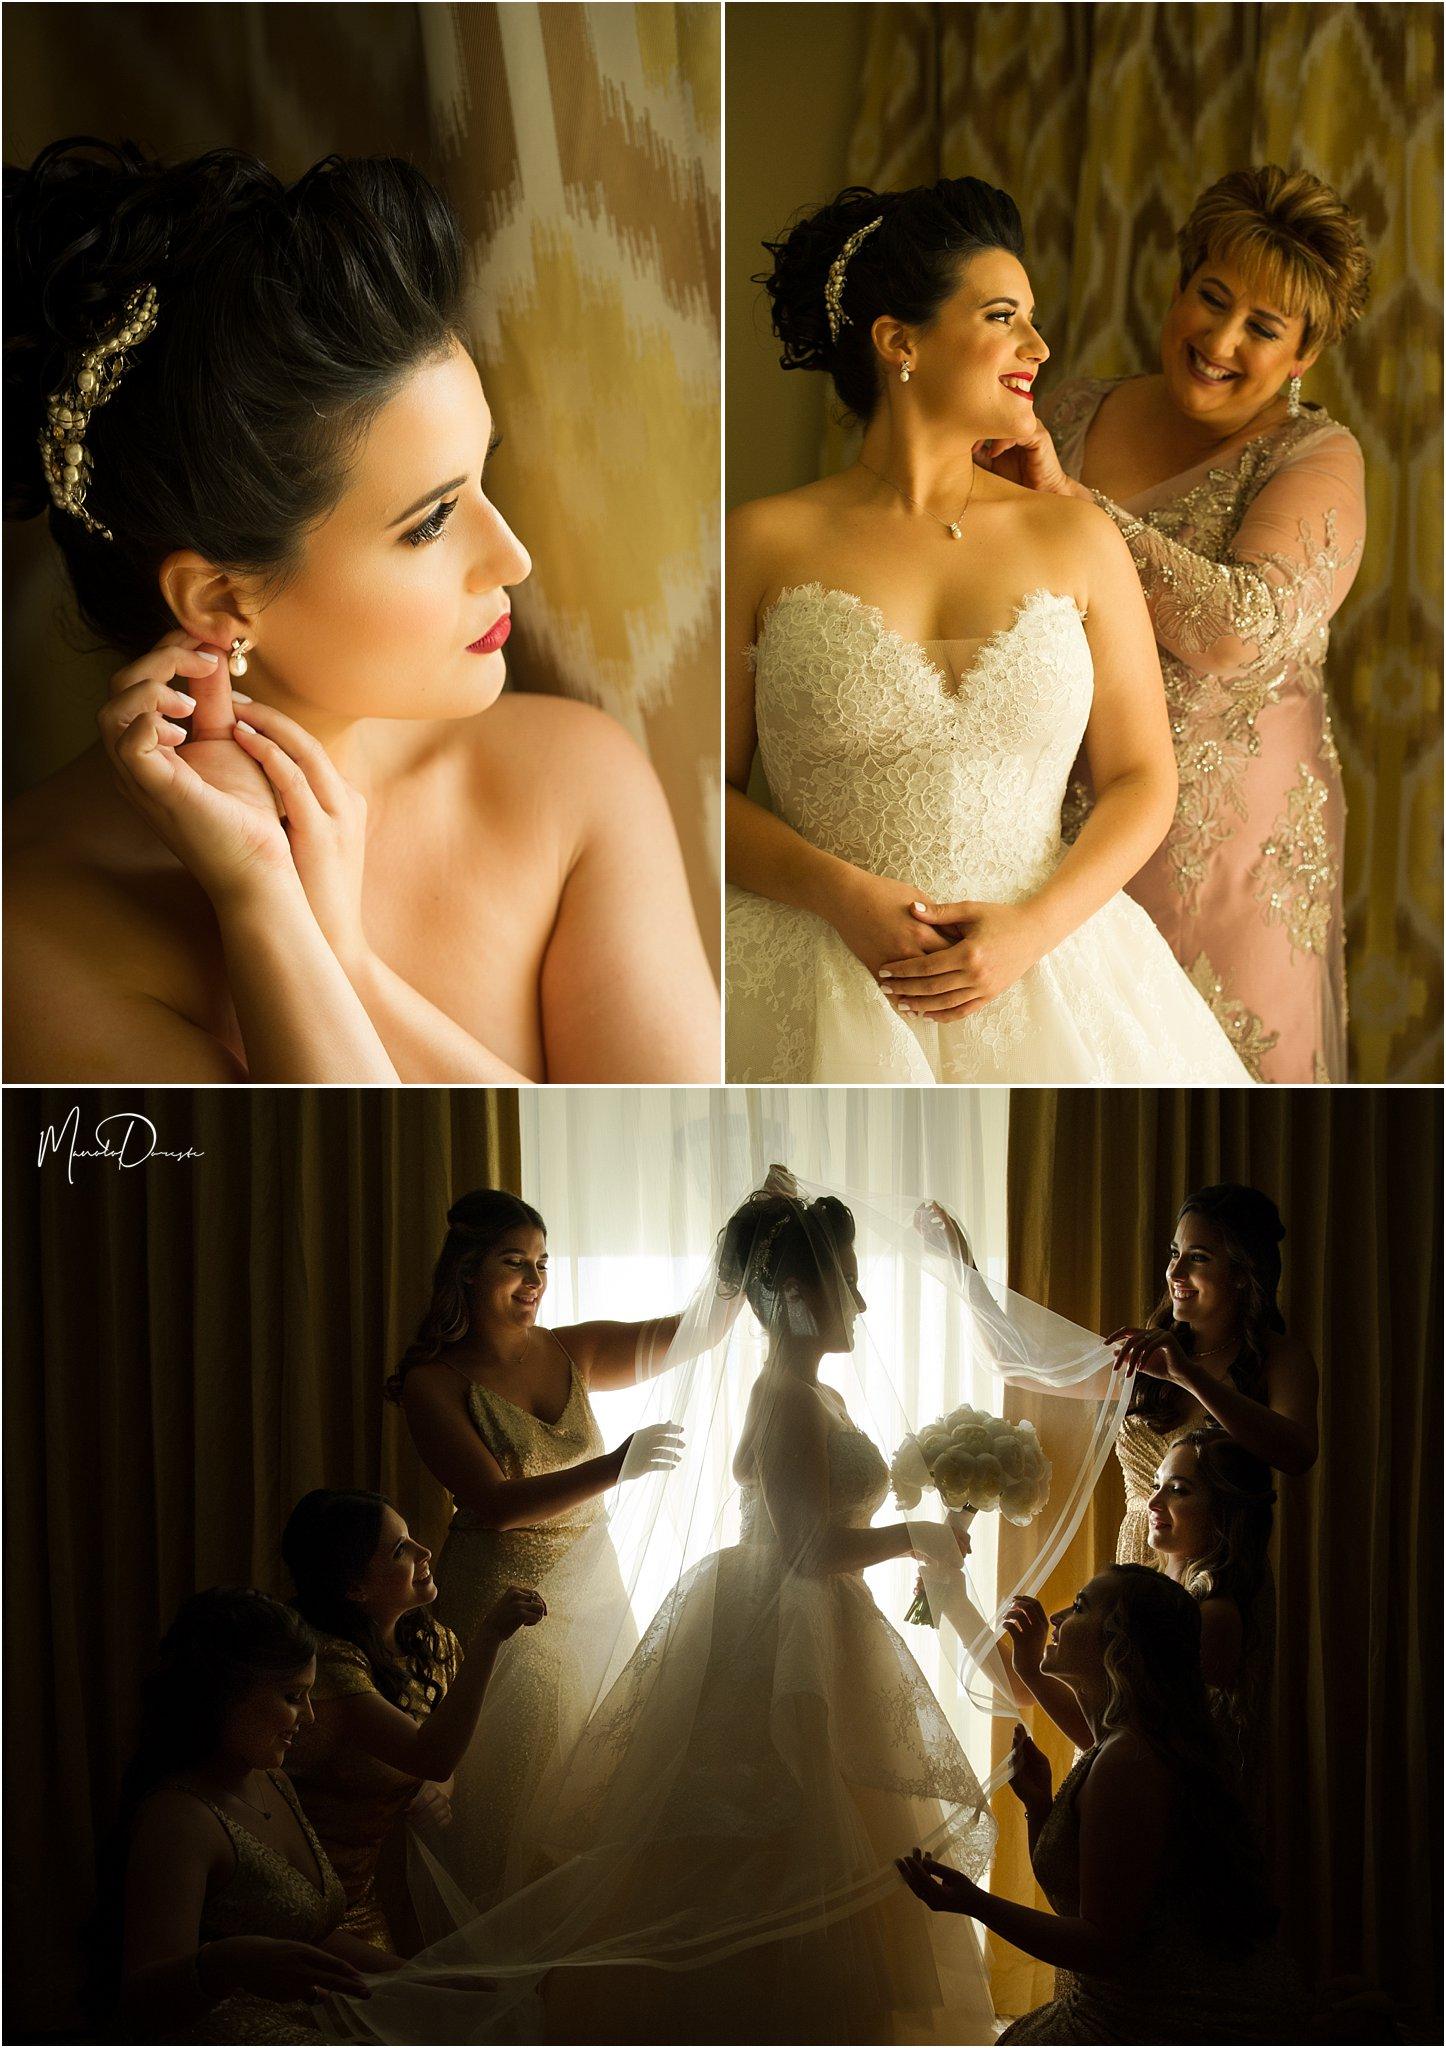 00954_ManoloDoreste_InFocusStudios_Wedding_Family_Photography_Miami_MiamiPhotographer.jpg